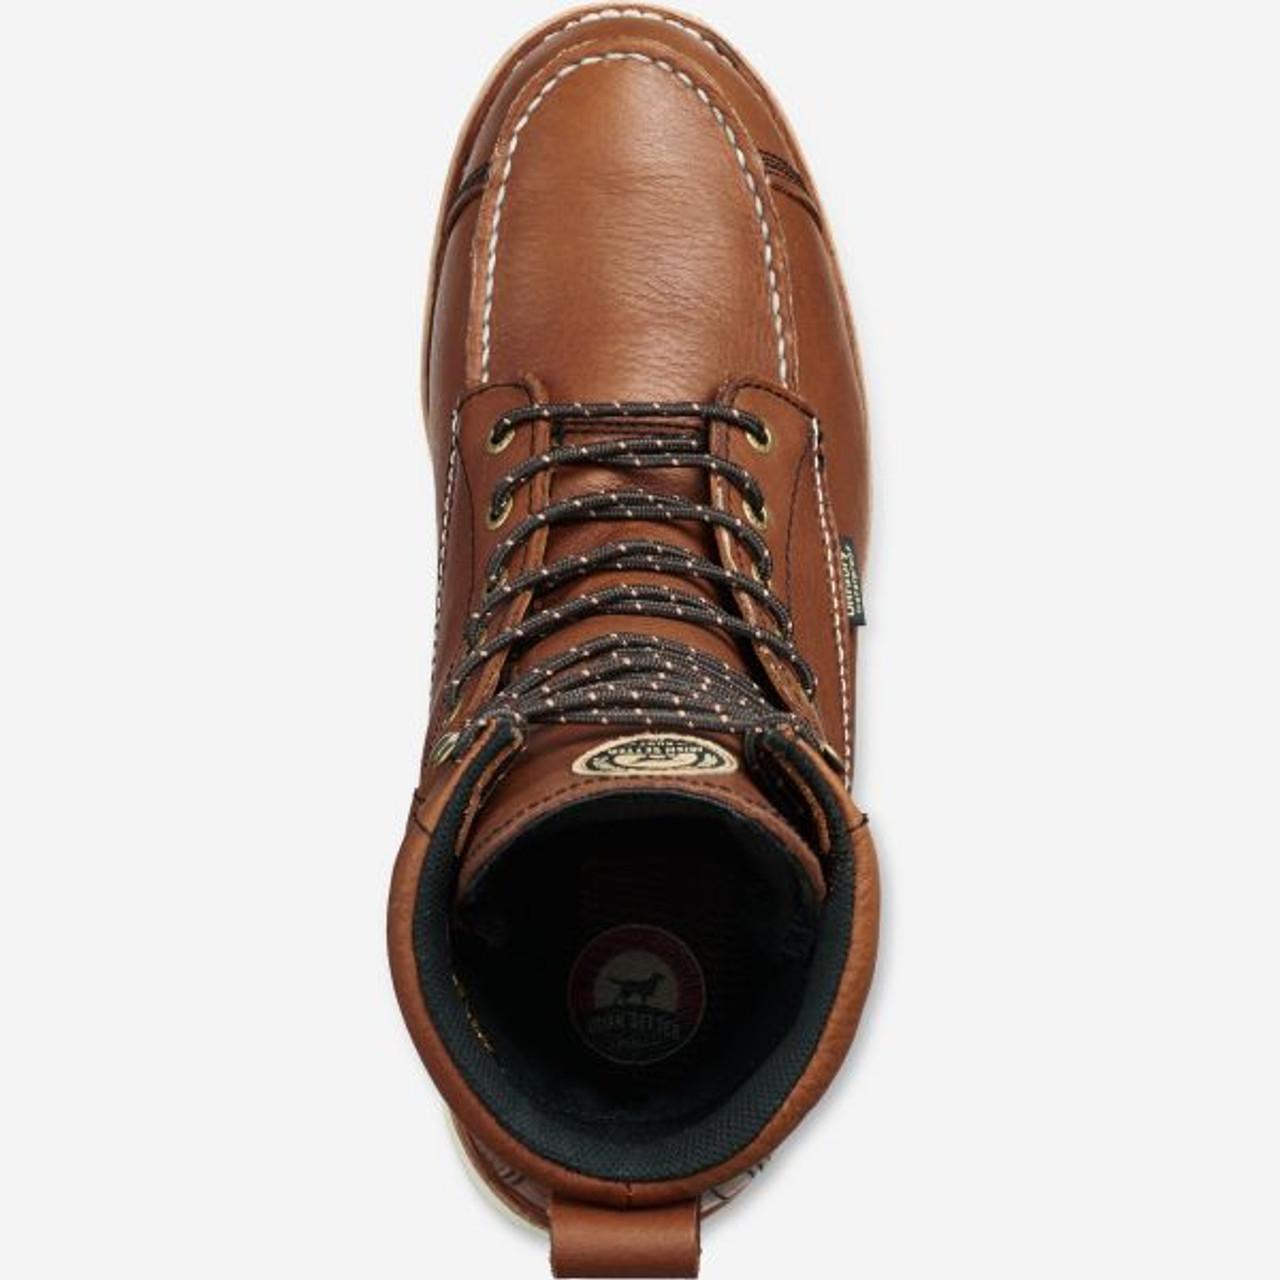 irish setter boots 896